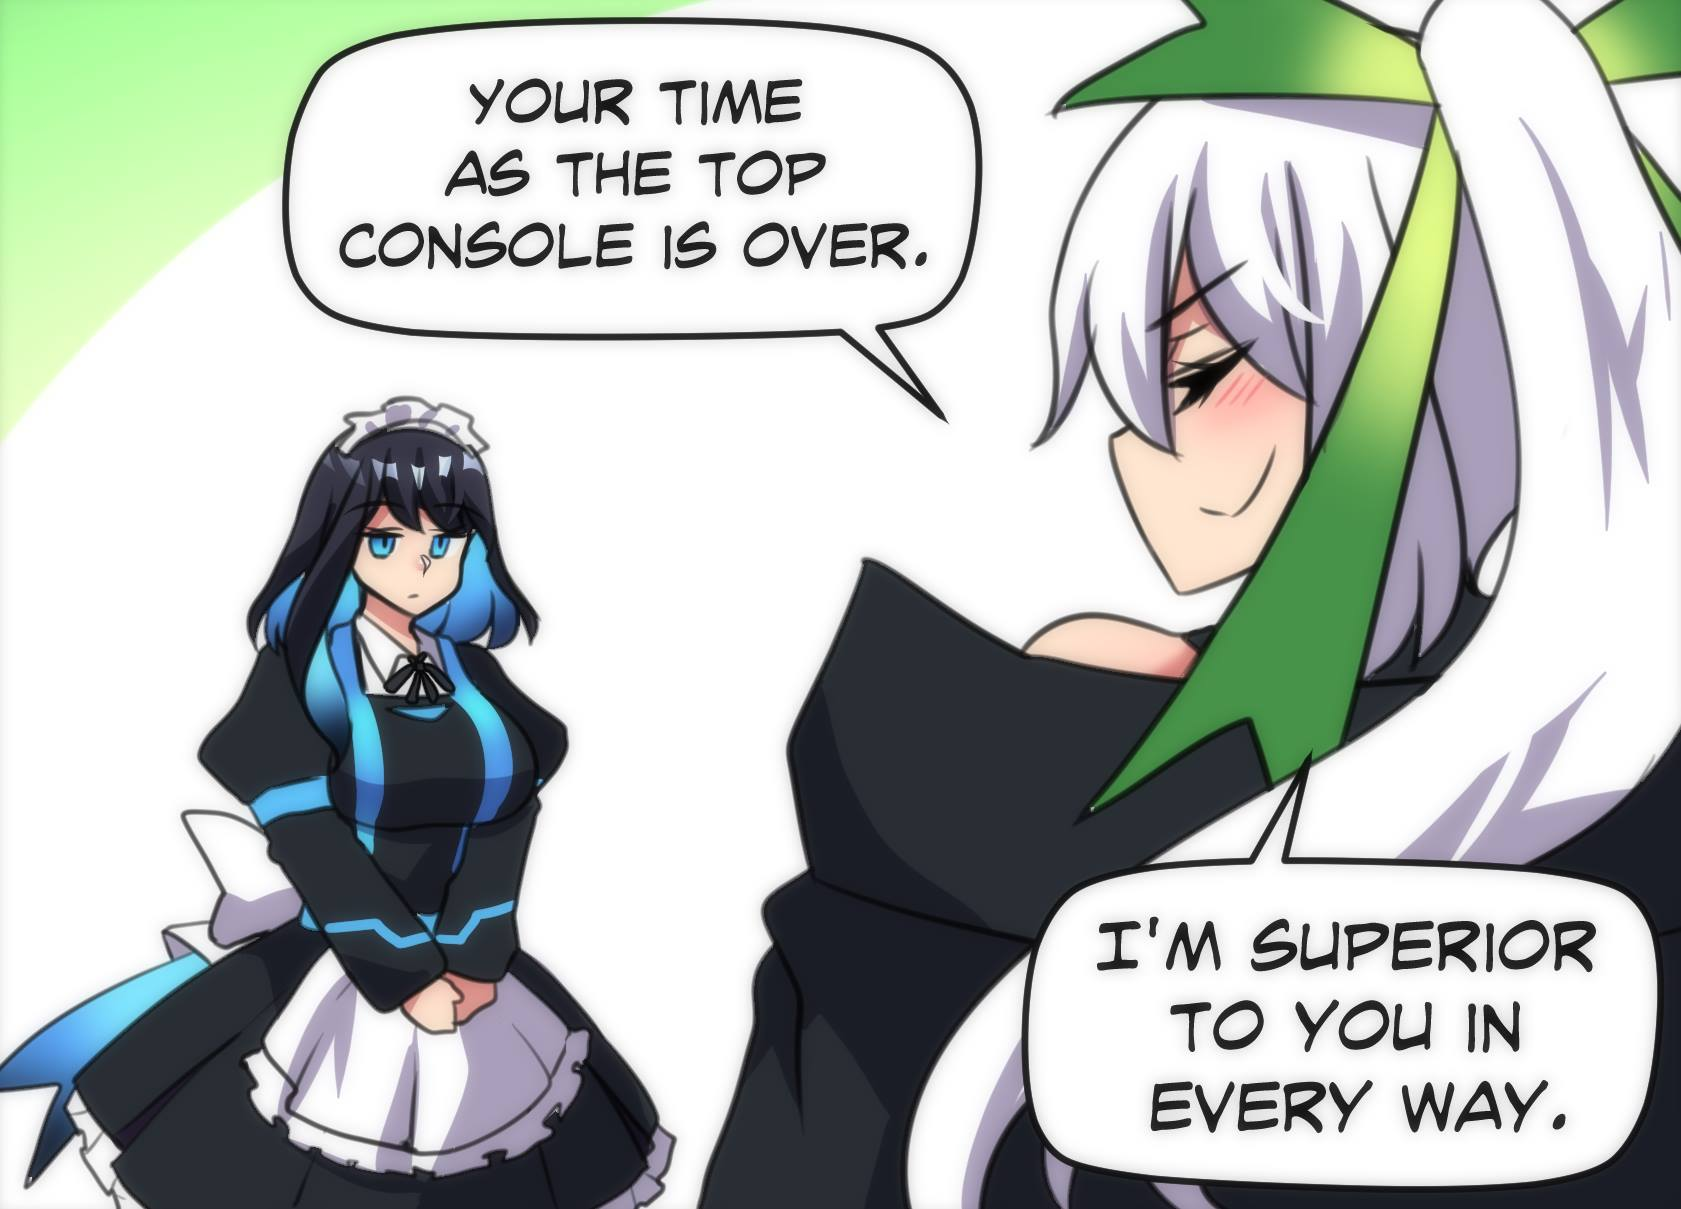 Playstation 5 vs. Xbox Series X